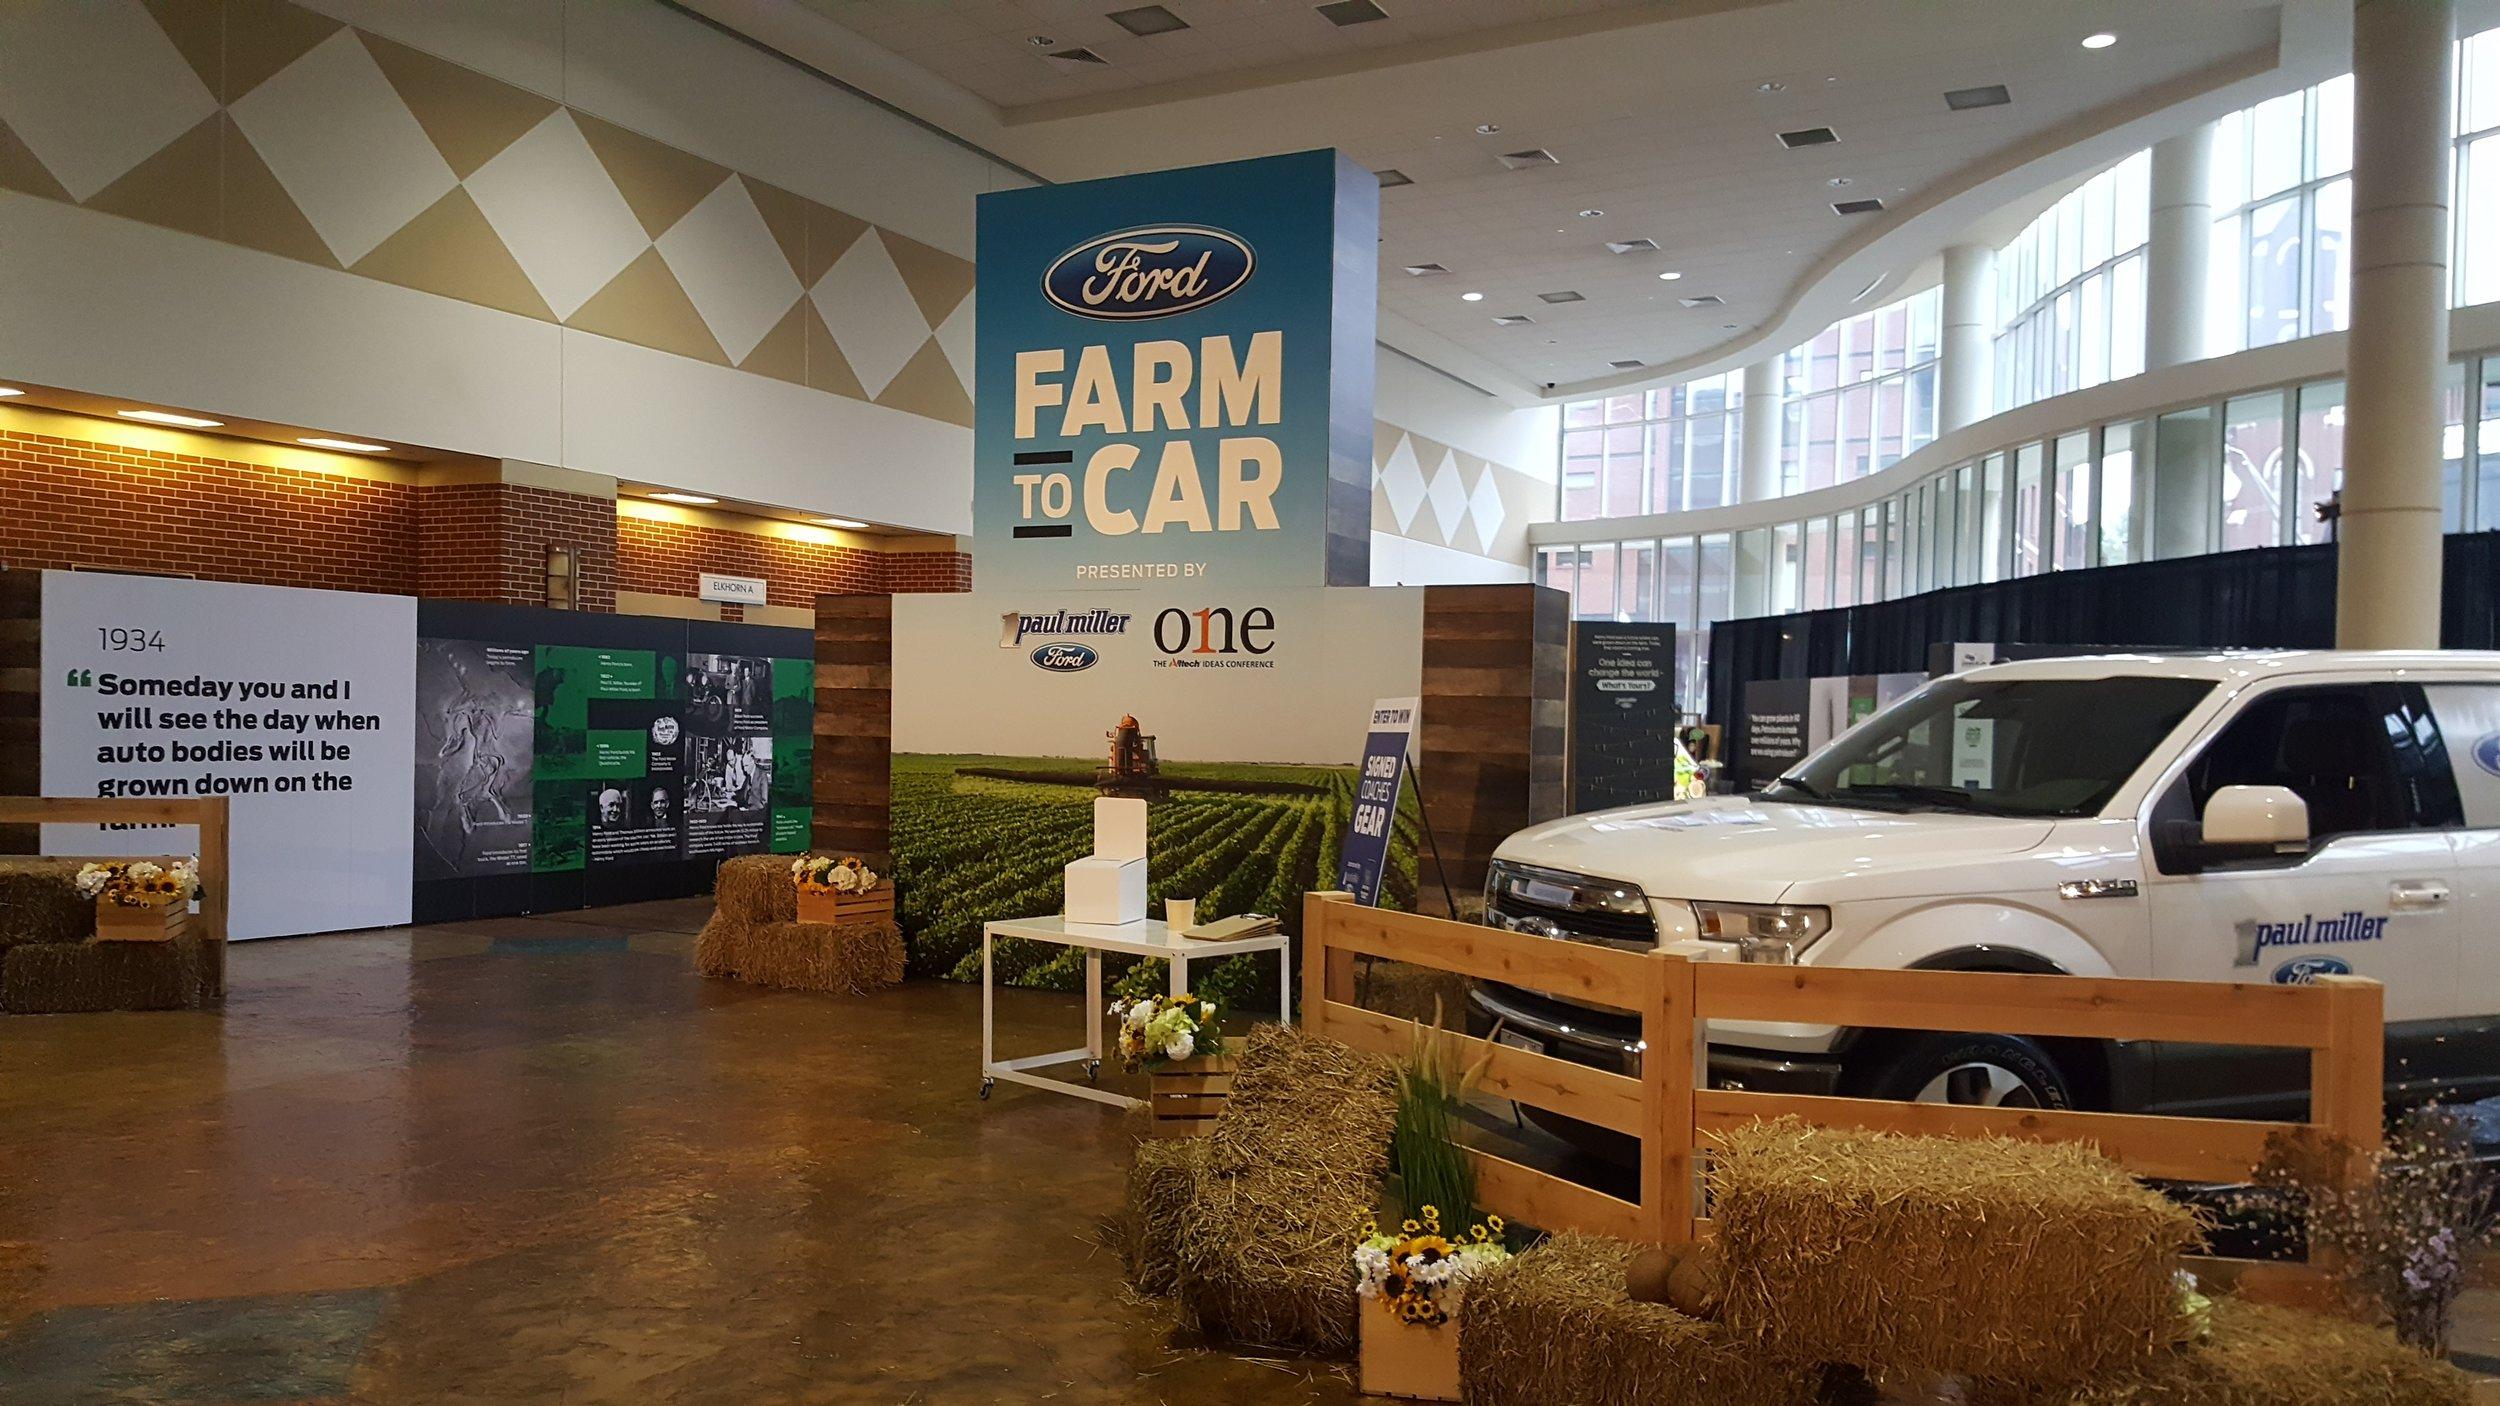 Ford Farm to Car Exhibit, Lexington, KY.  Zipie & Paul Miller Ford